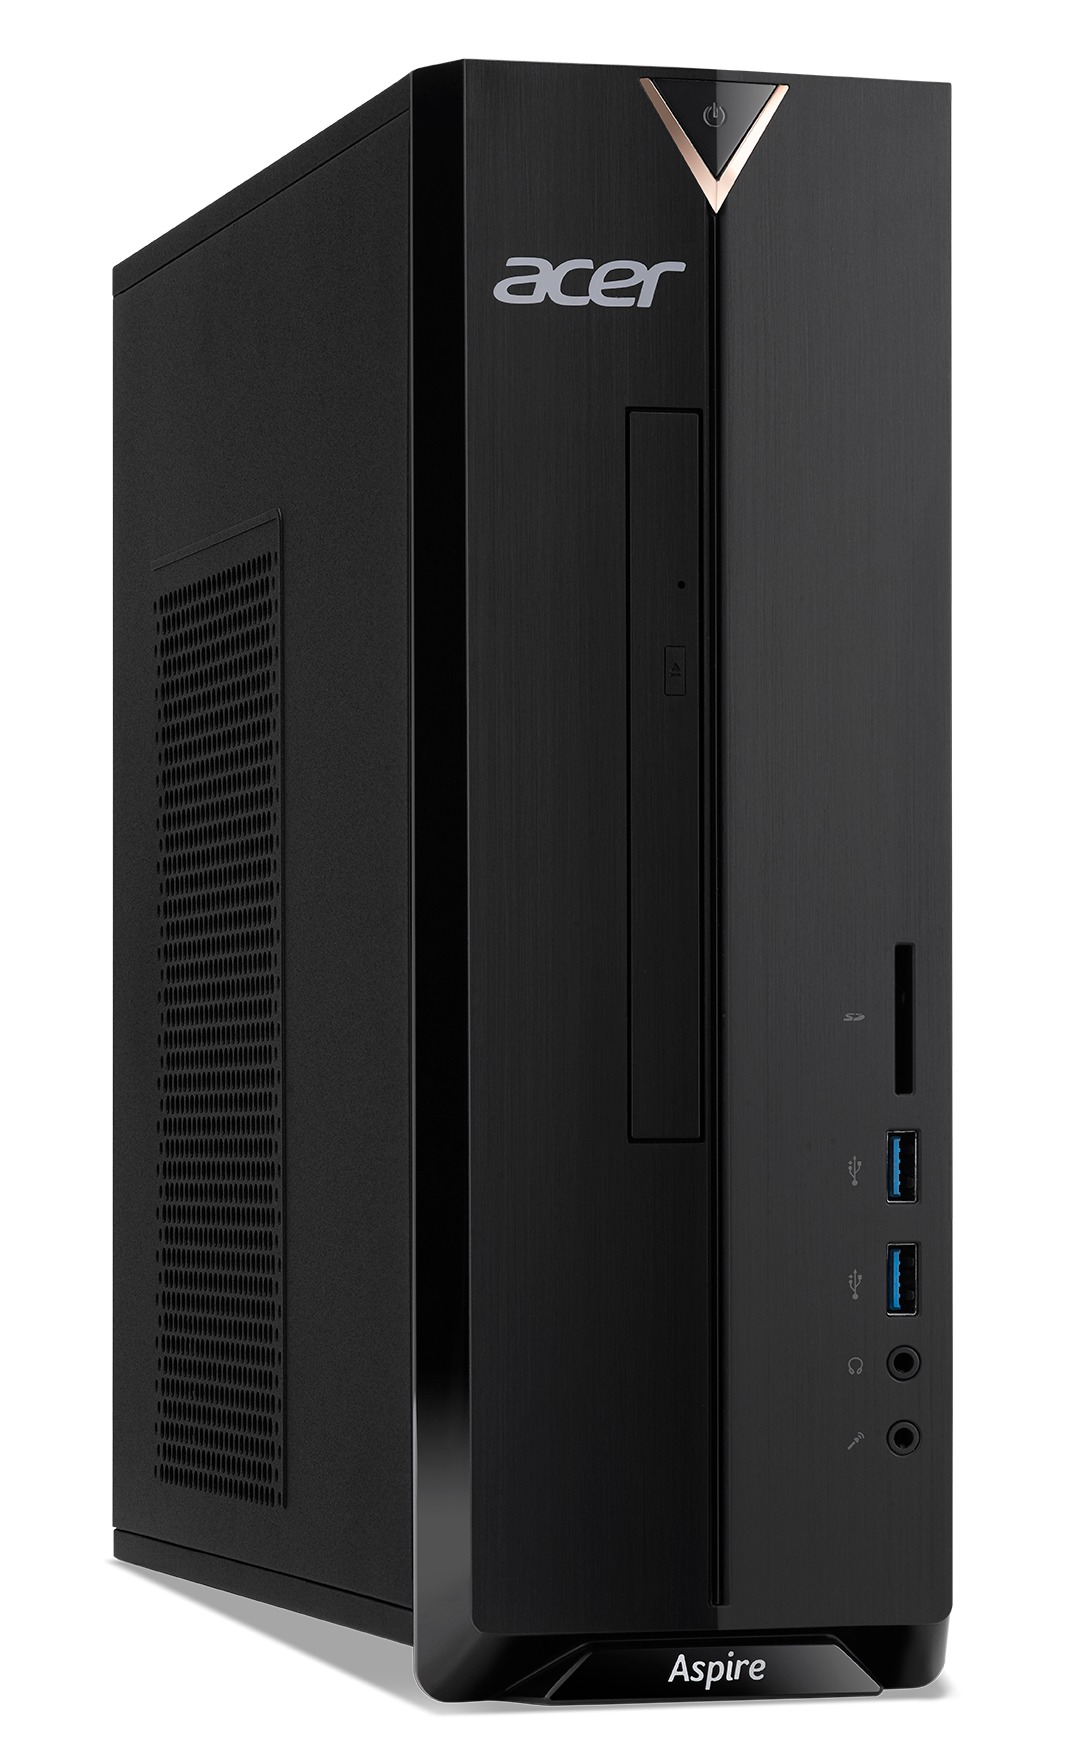 Acer Aspire XC-830 I1506 NL Desktop